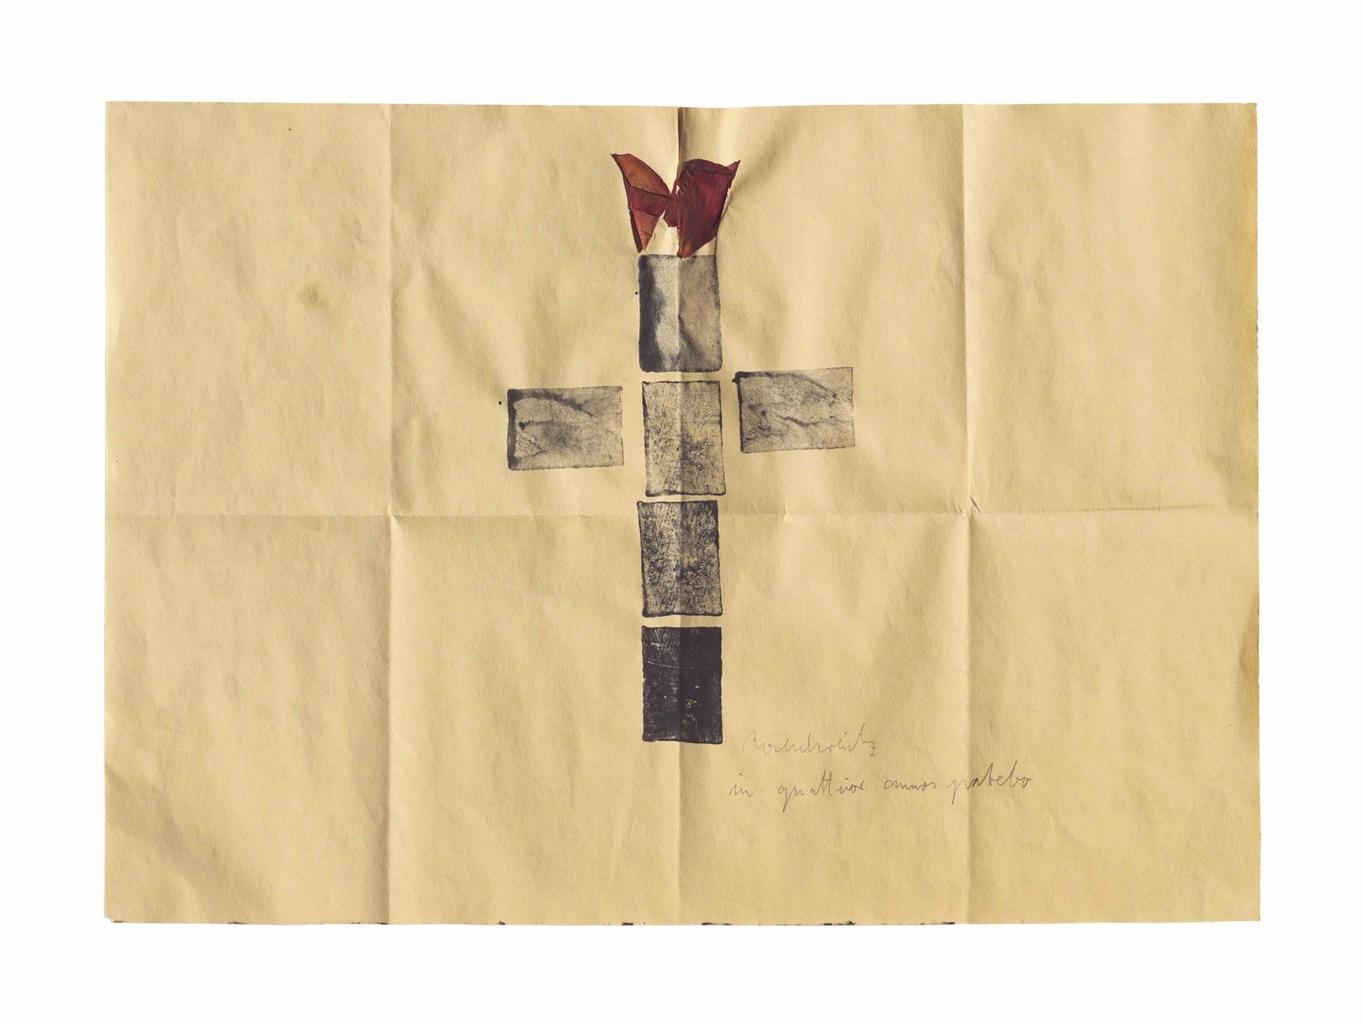 Anselm Kiefer-Untitled (Rosenkranz) (Untitled (Rosary))-1970